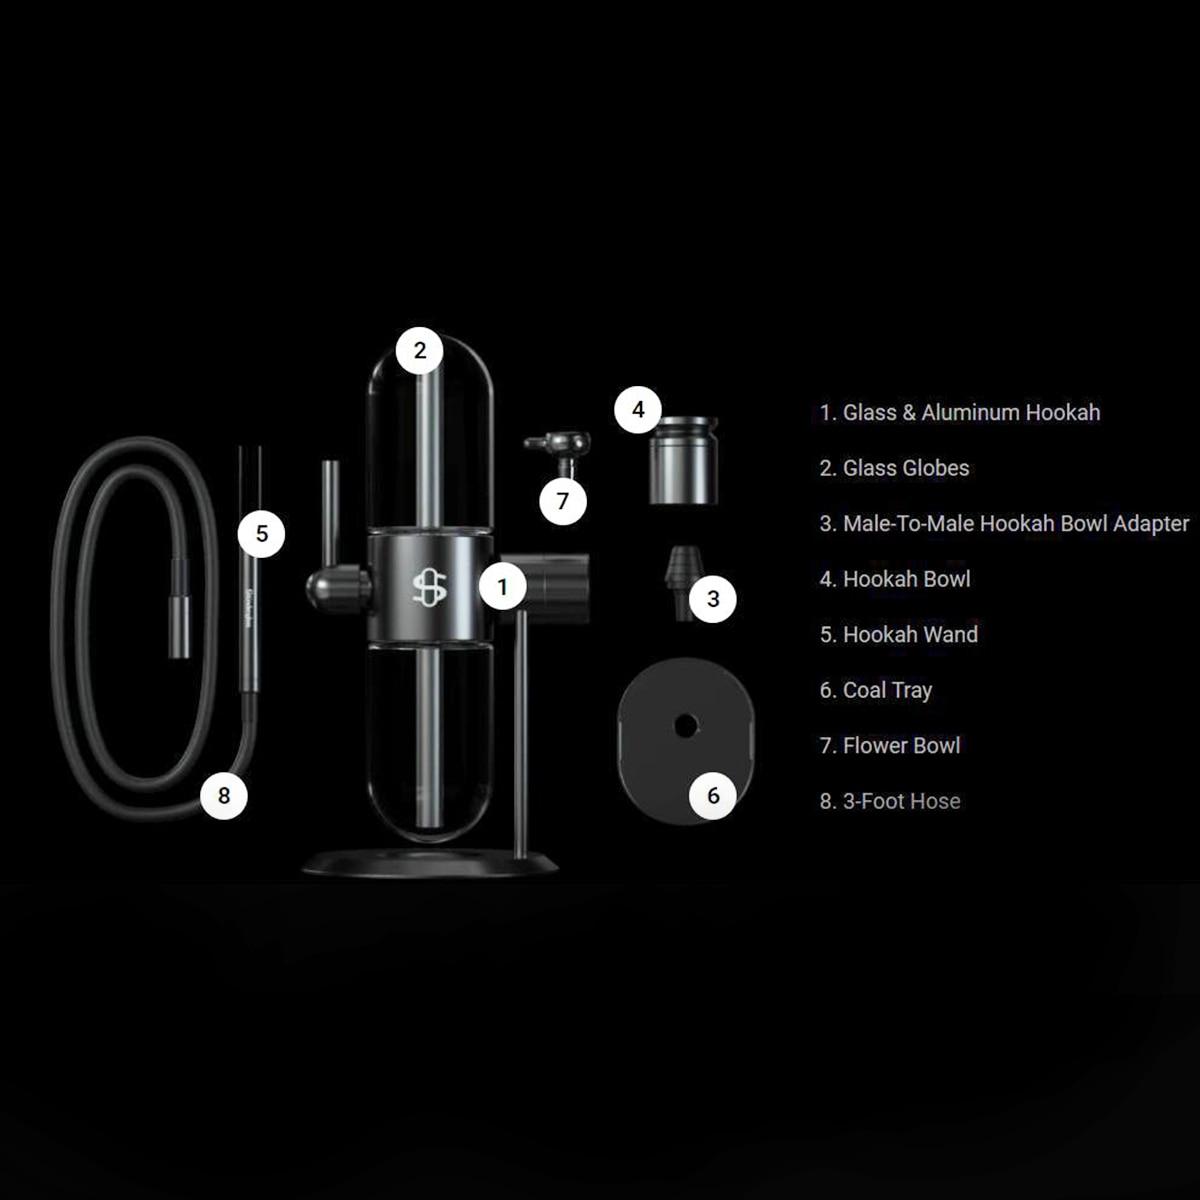 Premium Luxurious Gravity Pyrex Stundenglass Hookah Shisha Glass Bongs Weed Water Pipe 6